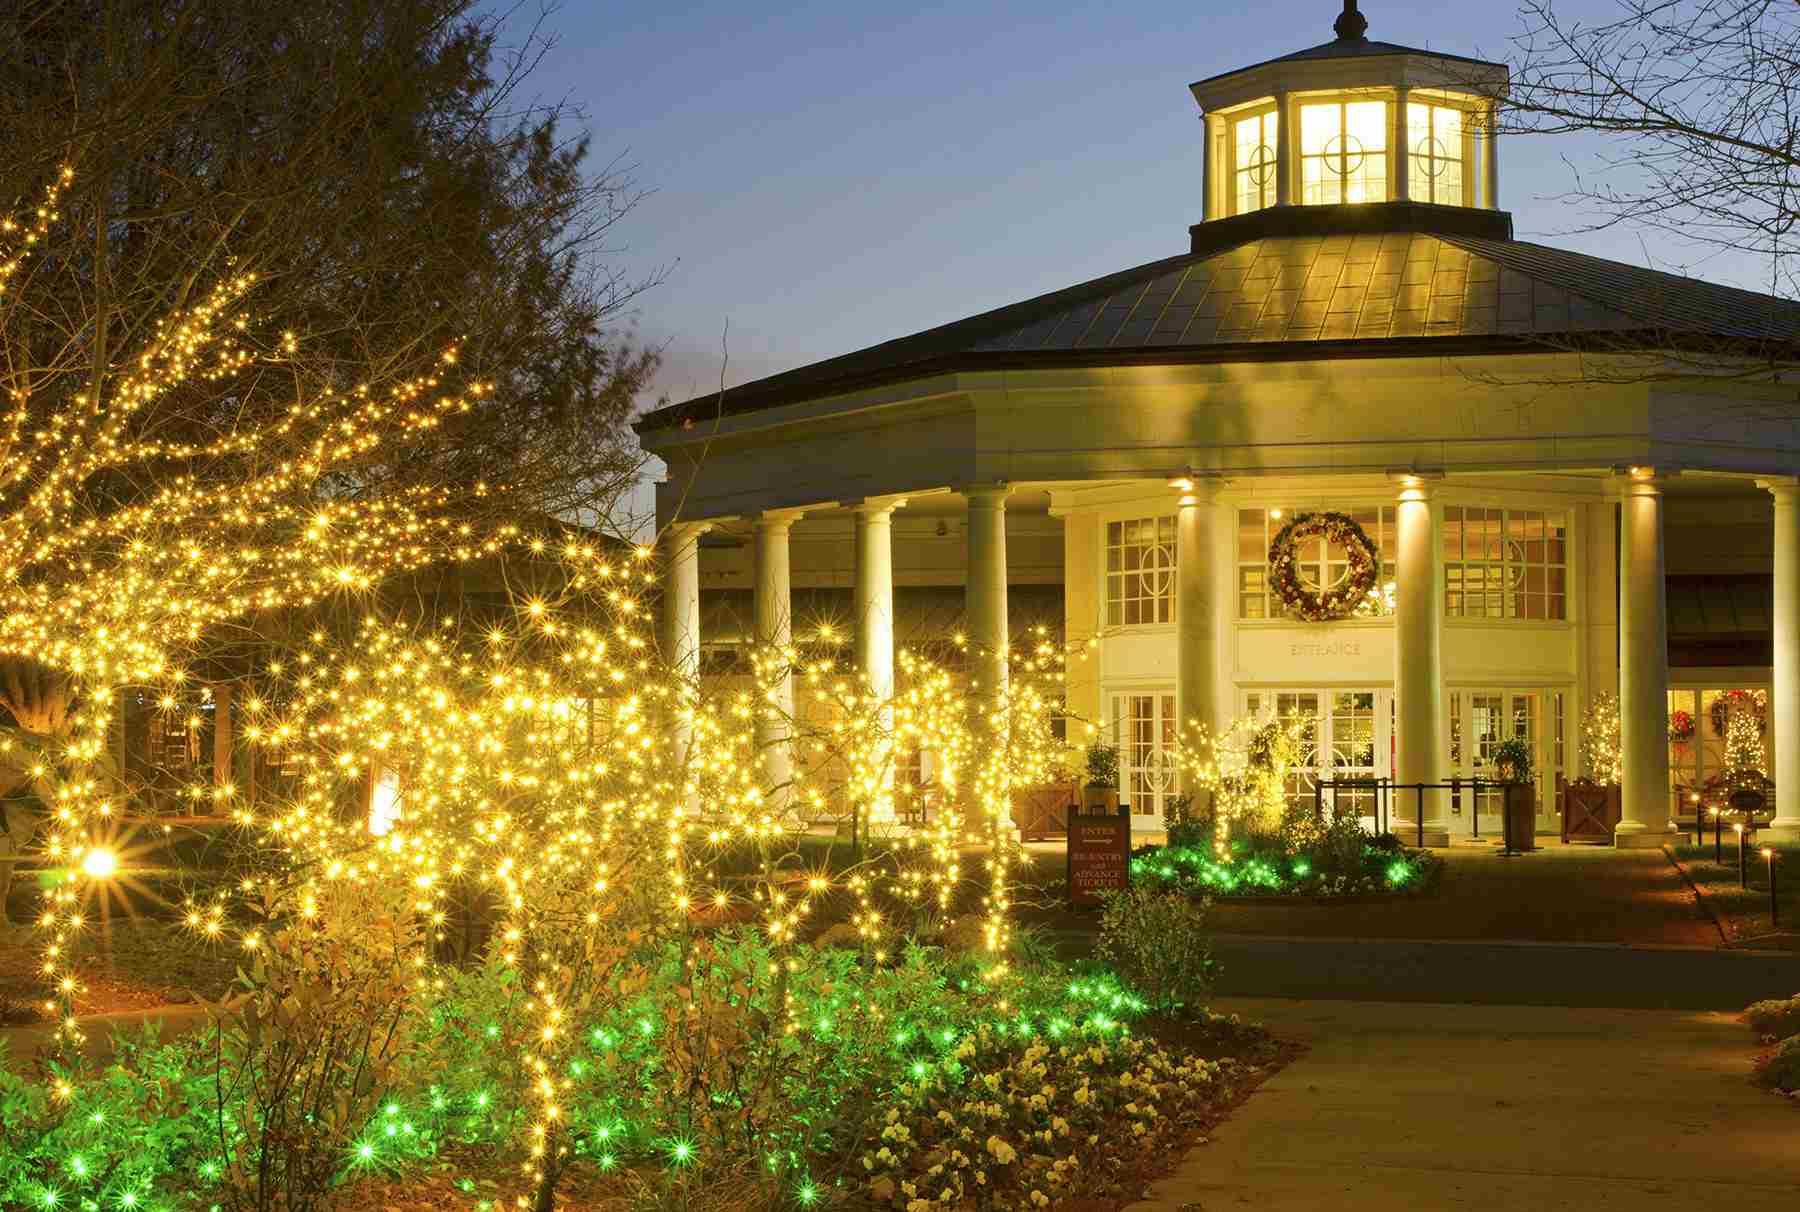 Daniel Stowe Botanical Garden Christmas